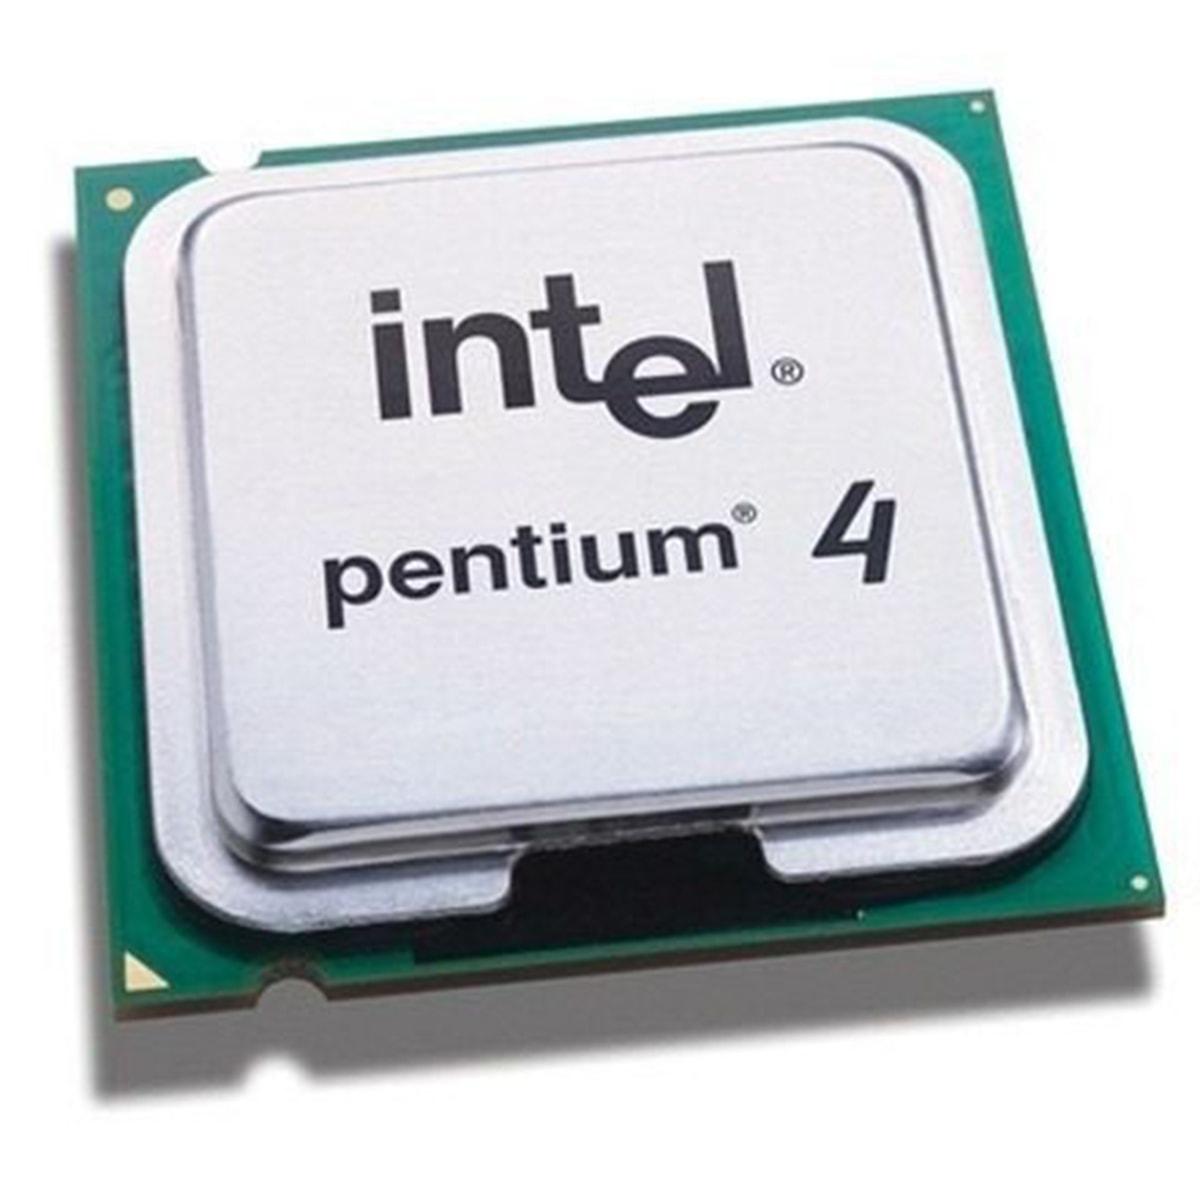 Processador Intel Pentium 4 511 1M Cache / 2.80 GHz / 533 MHz / Socket 775 - Seminovo